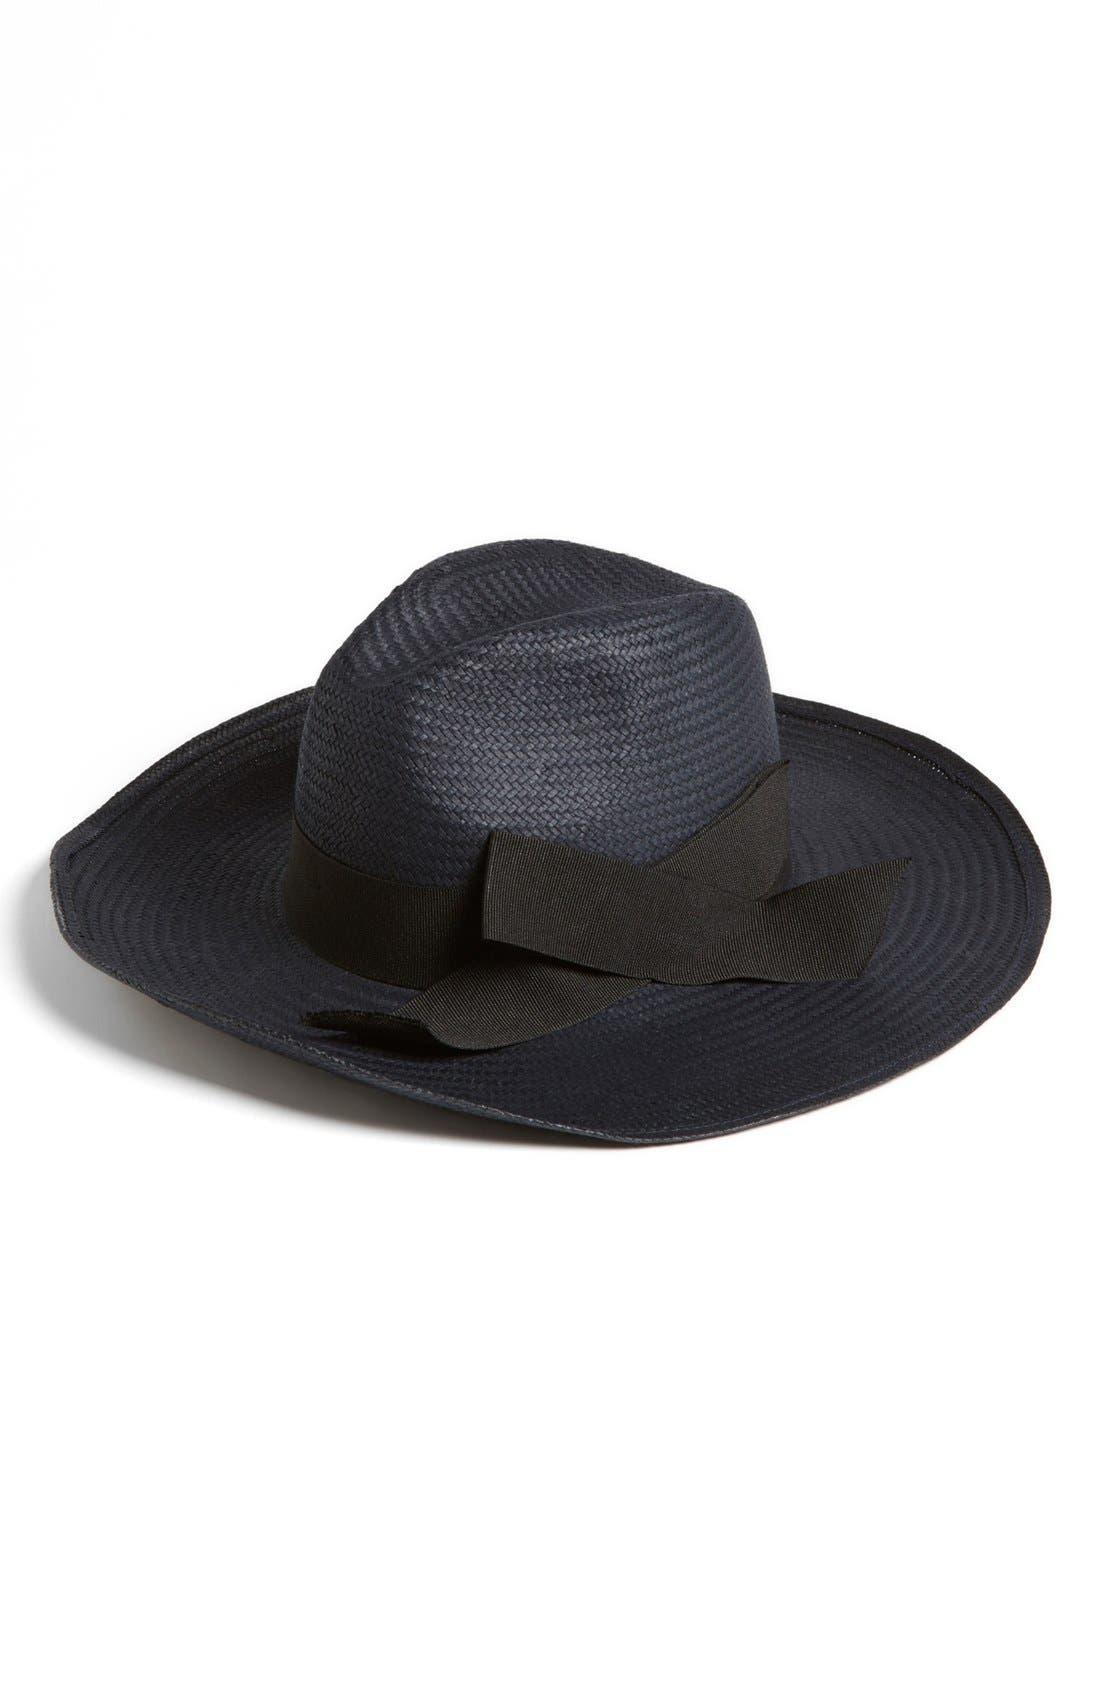 Alternate Image 1 Selected - Nordstrom 'Drama' Hat